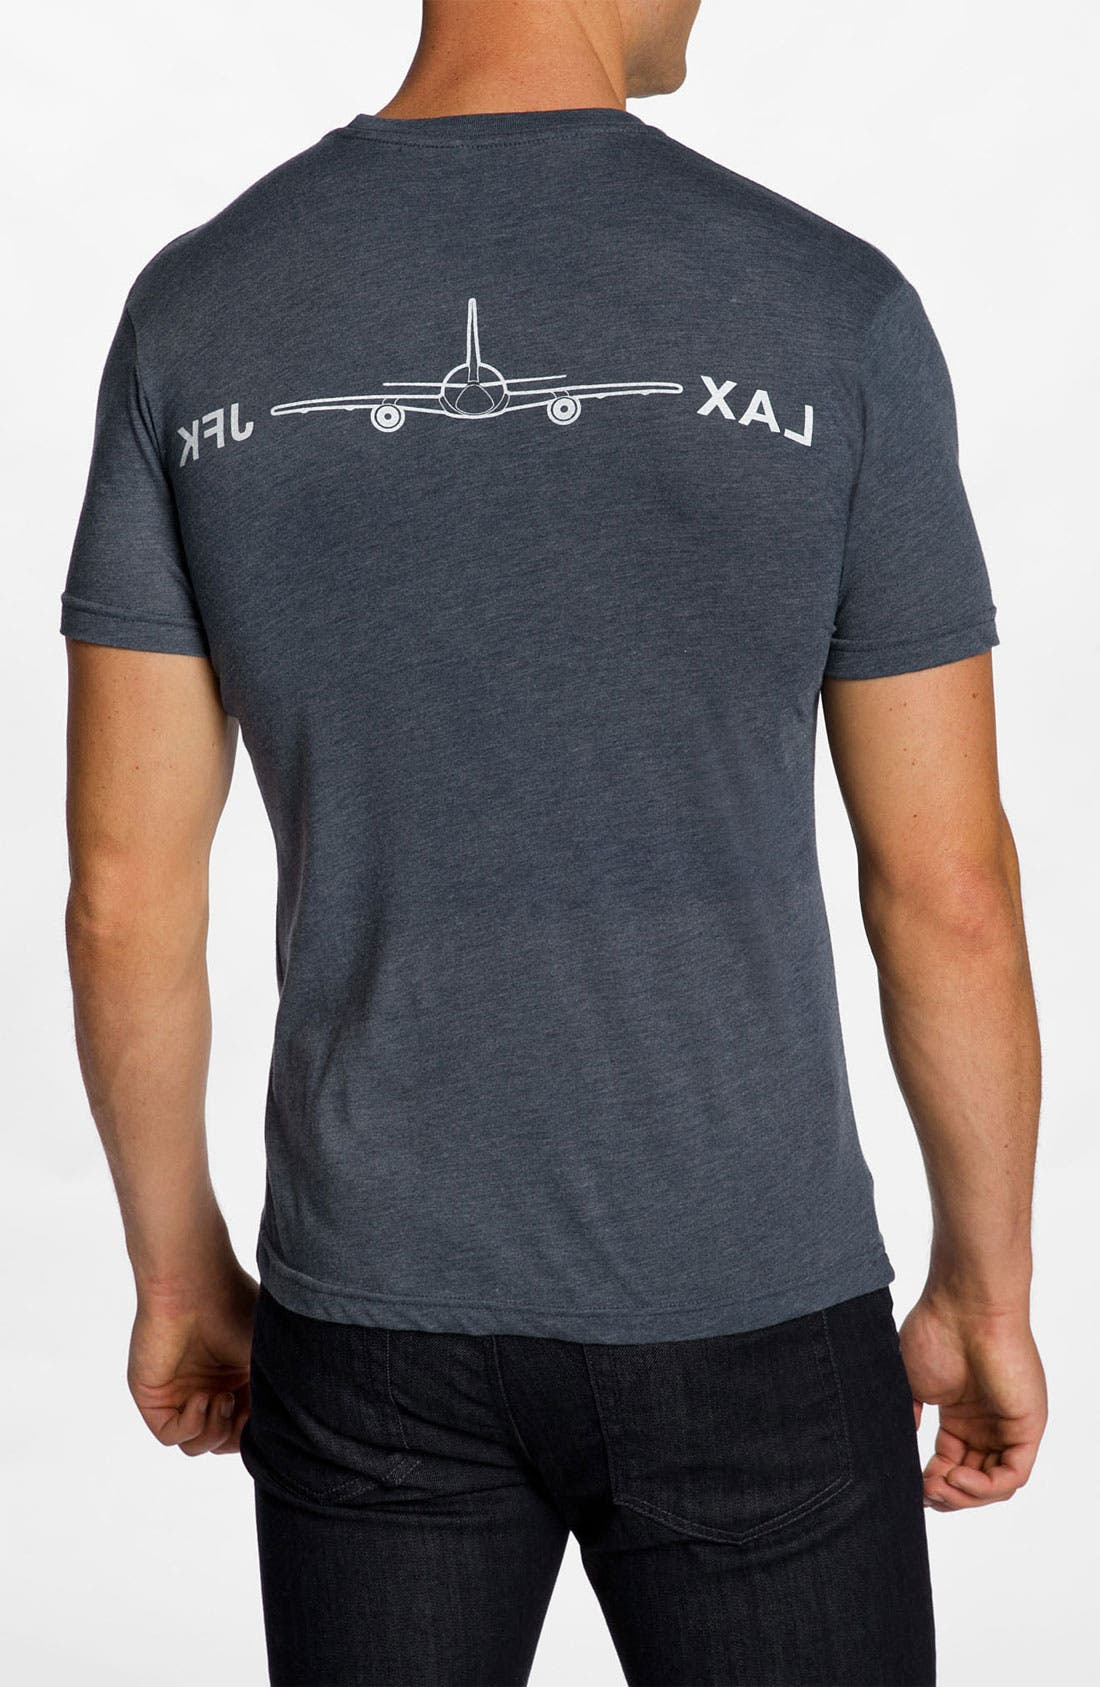 Alternate Image 2  - DiLascia 'LAX - JFK' T-Shirt